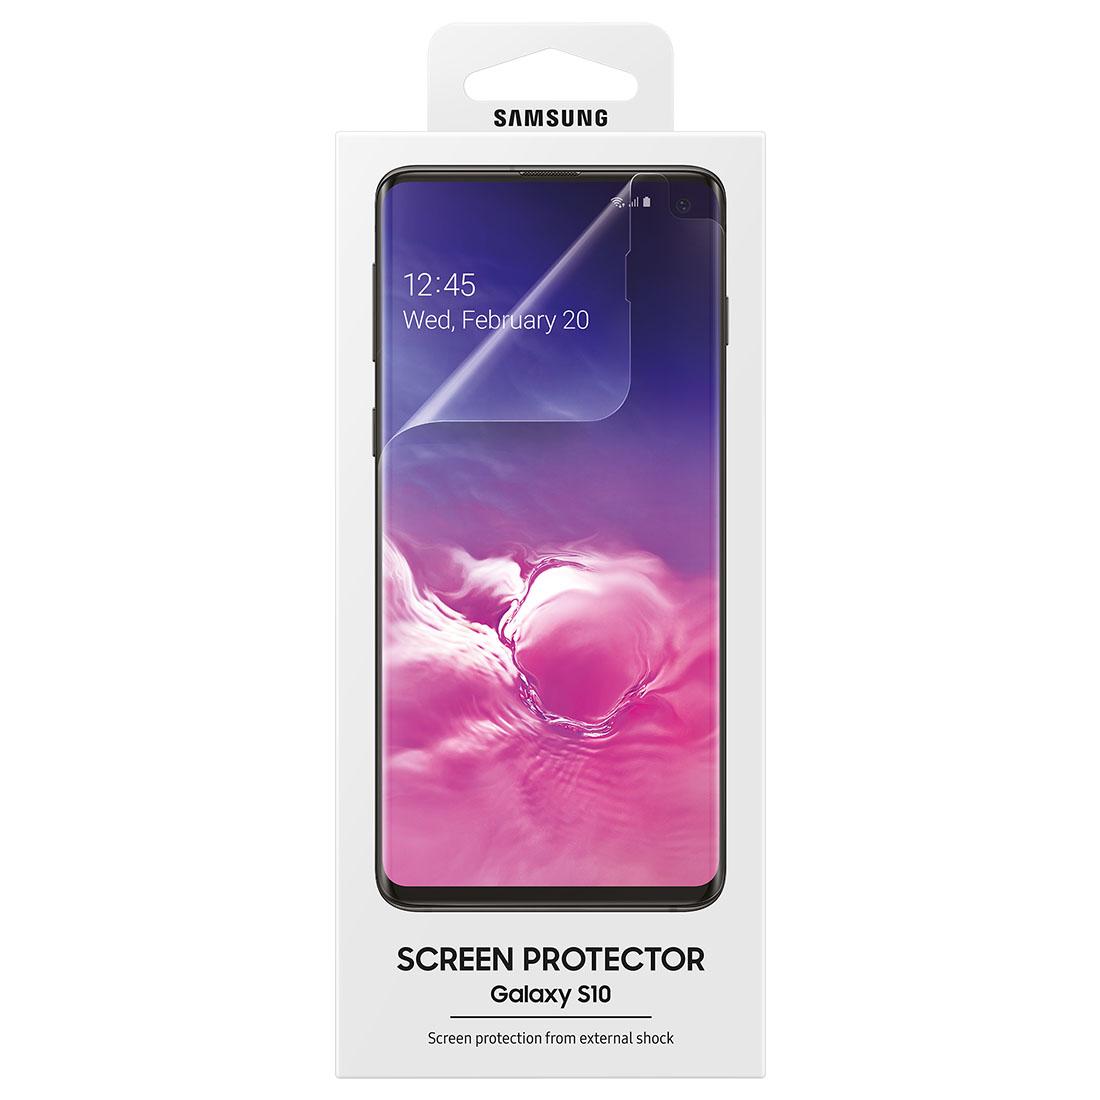 2x Película Protetora Original Samsung Galaxy S10 6.1 Pol G973